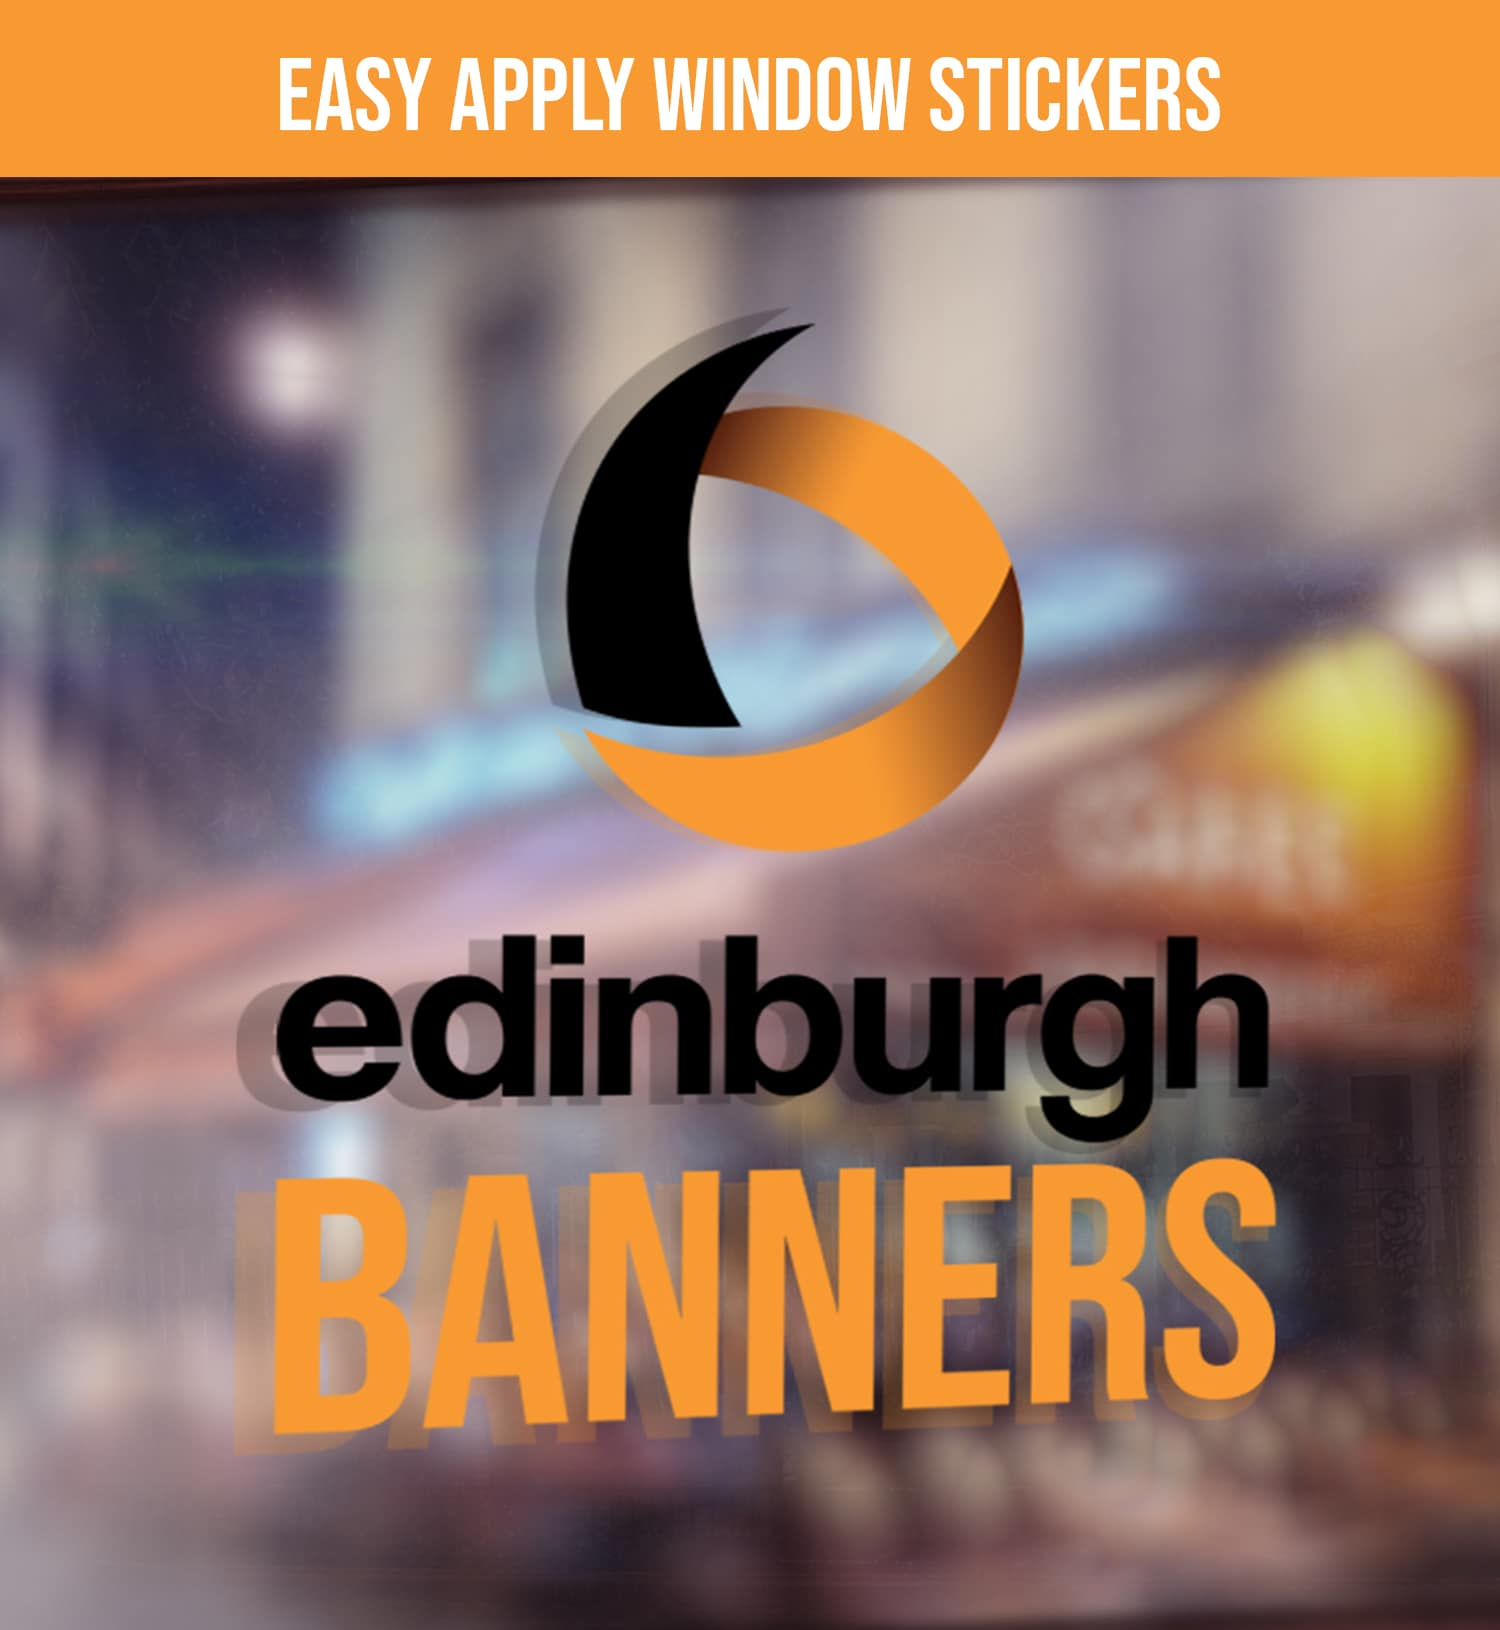 Edinburgh Banners Window Stickers